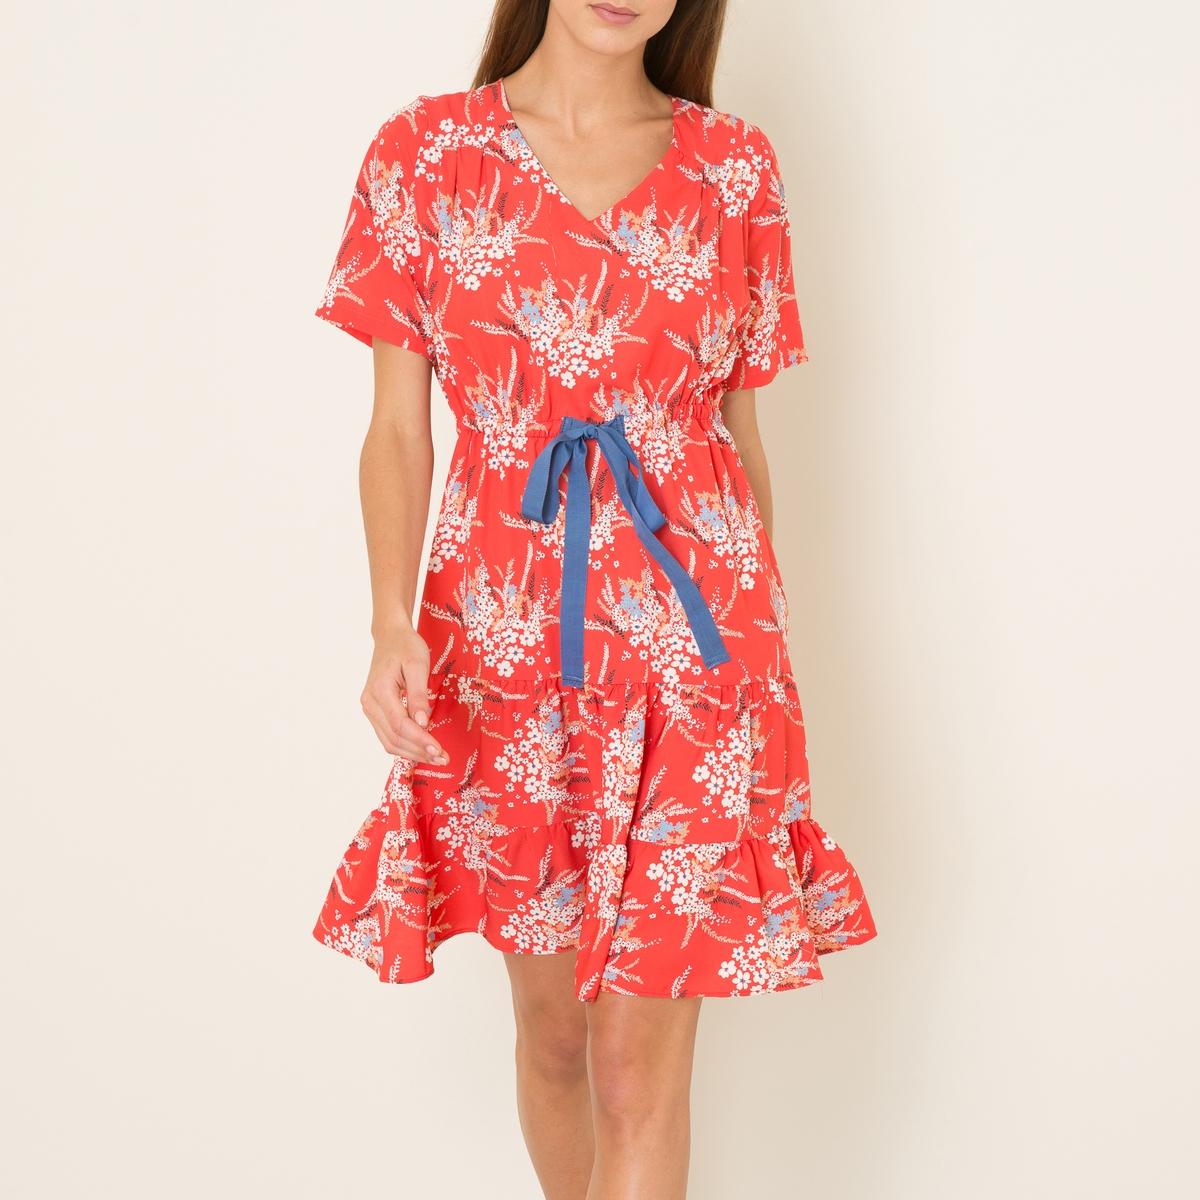 Платье LEONARD комплект бюстгальтер push up трусики quelle vivance 448359